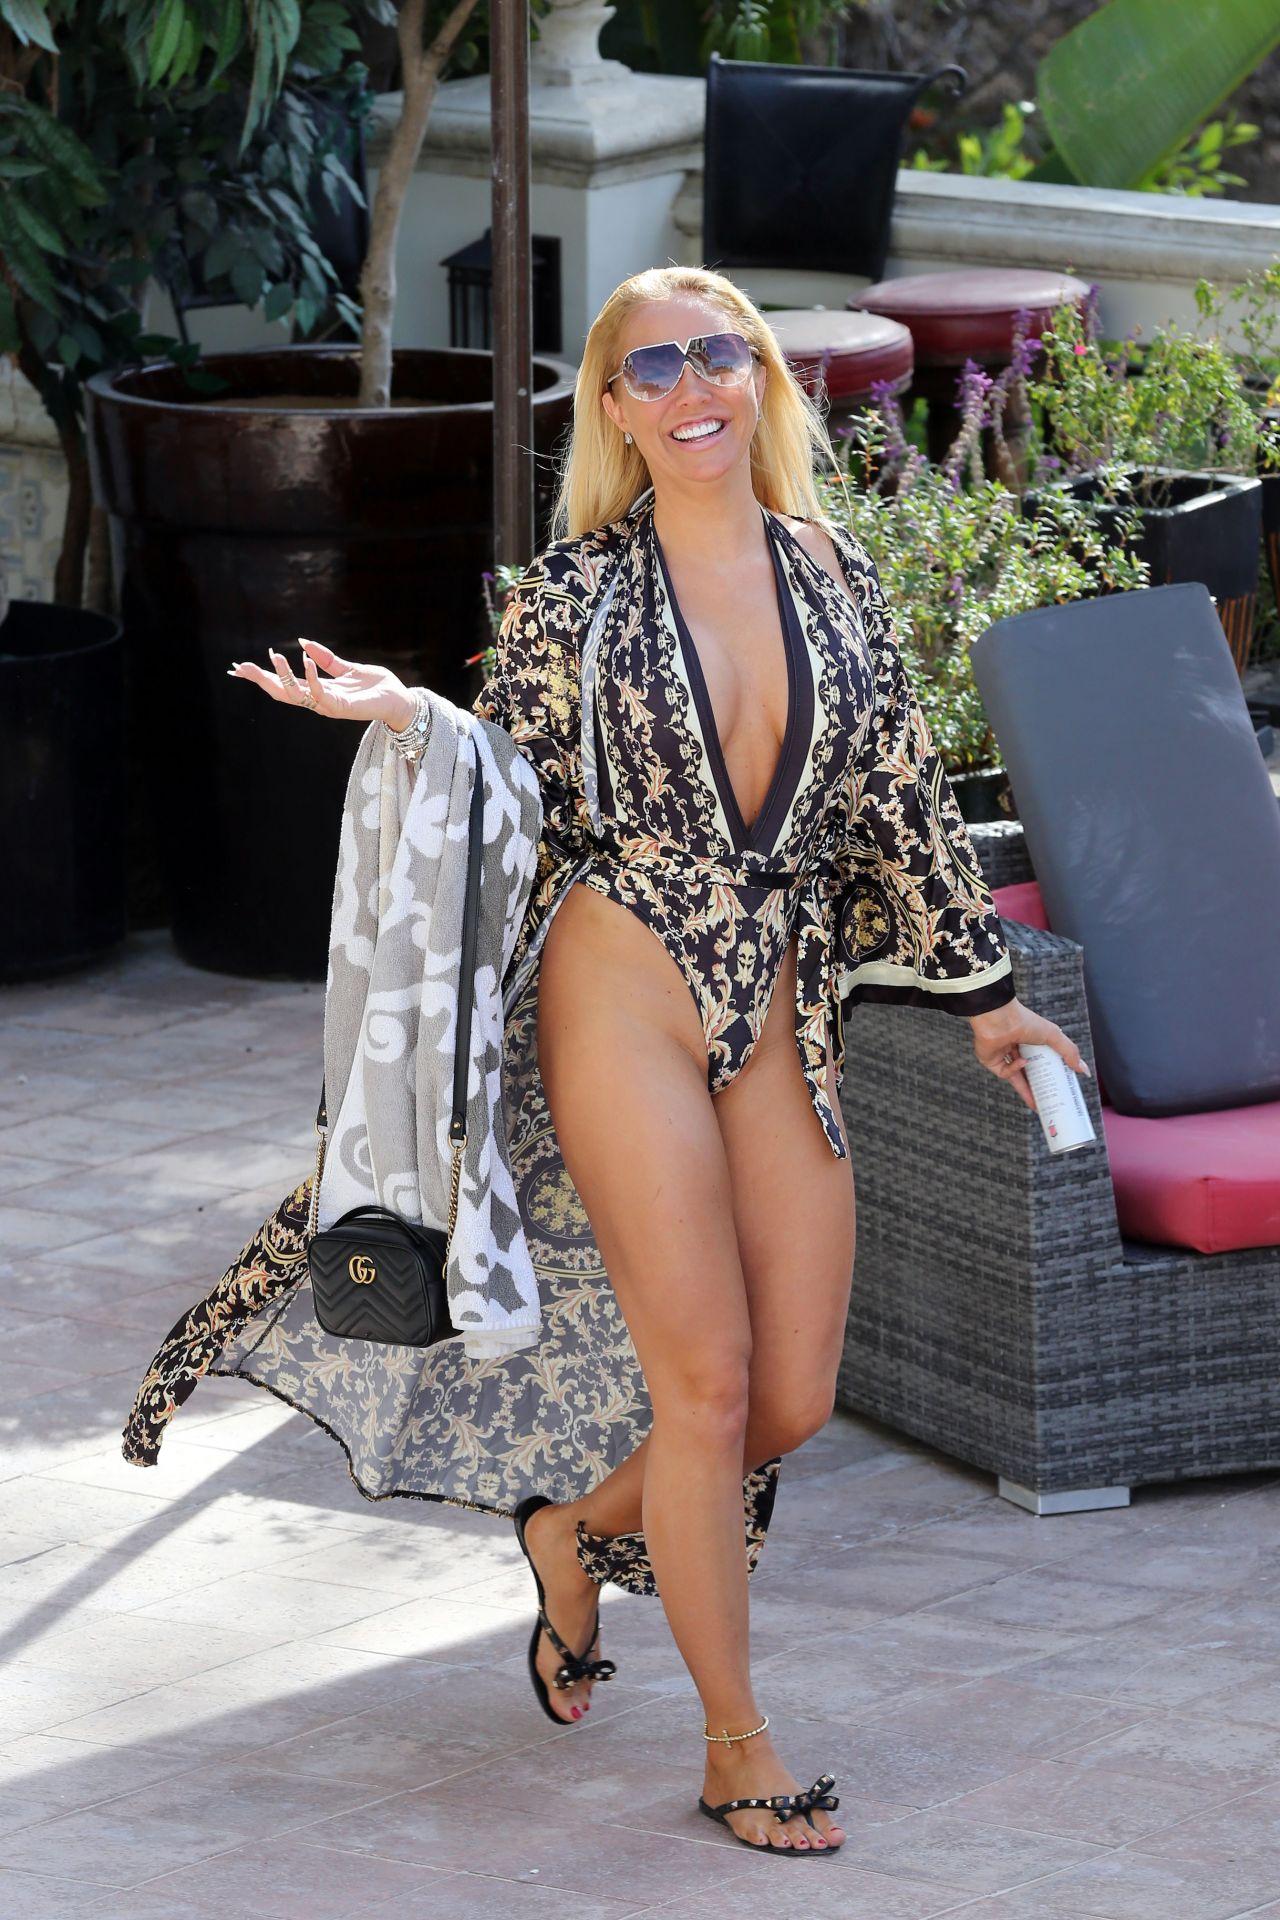 Aisleyne Horgan Wallace in Bikini Poolside in Los Angeles